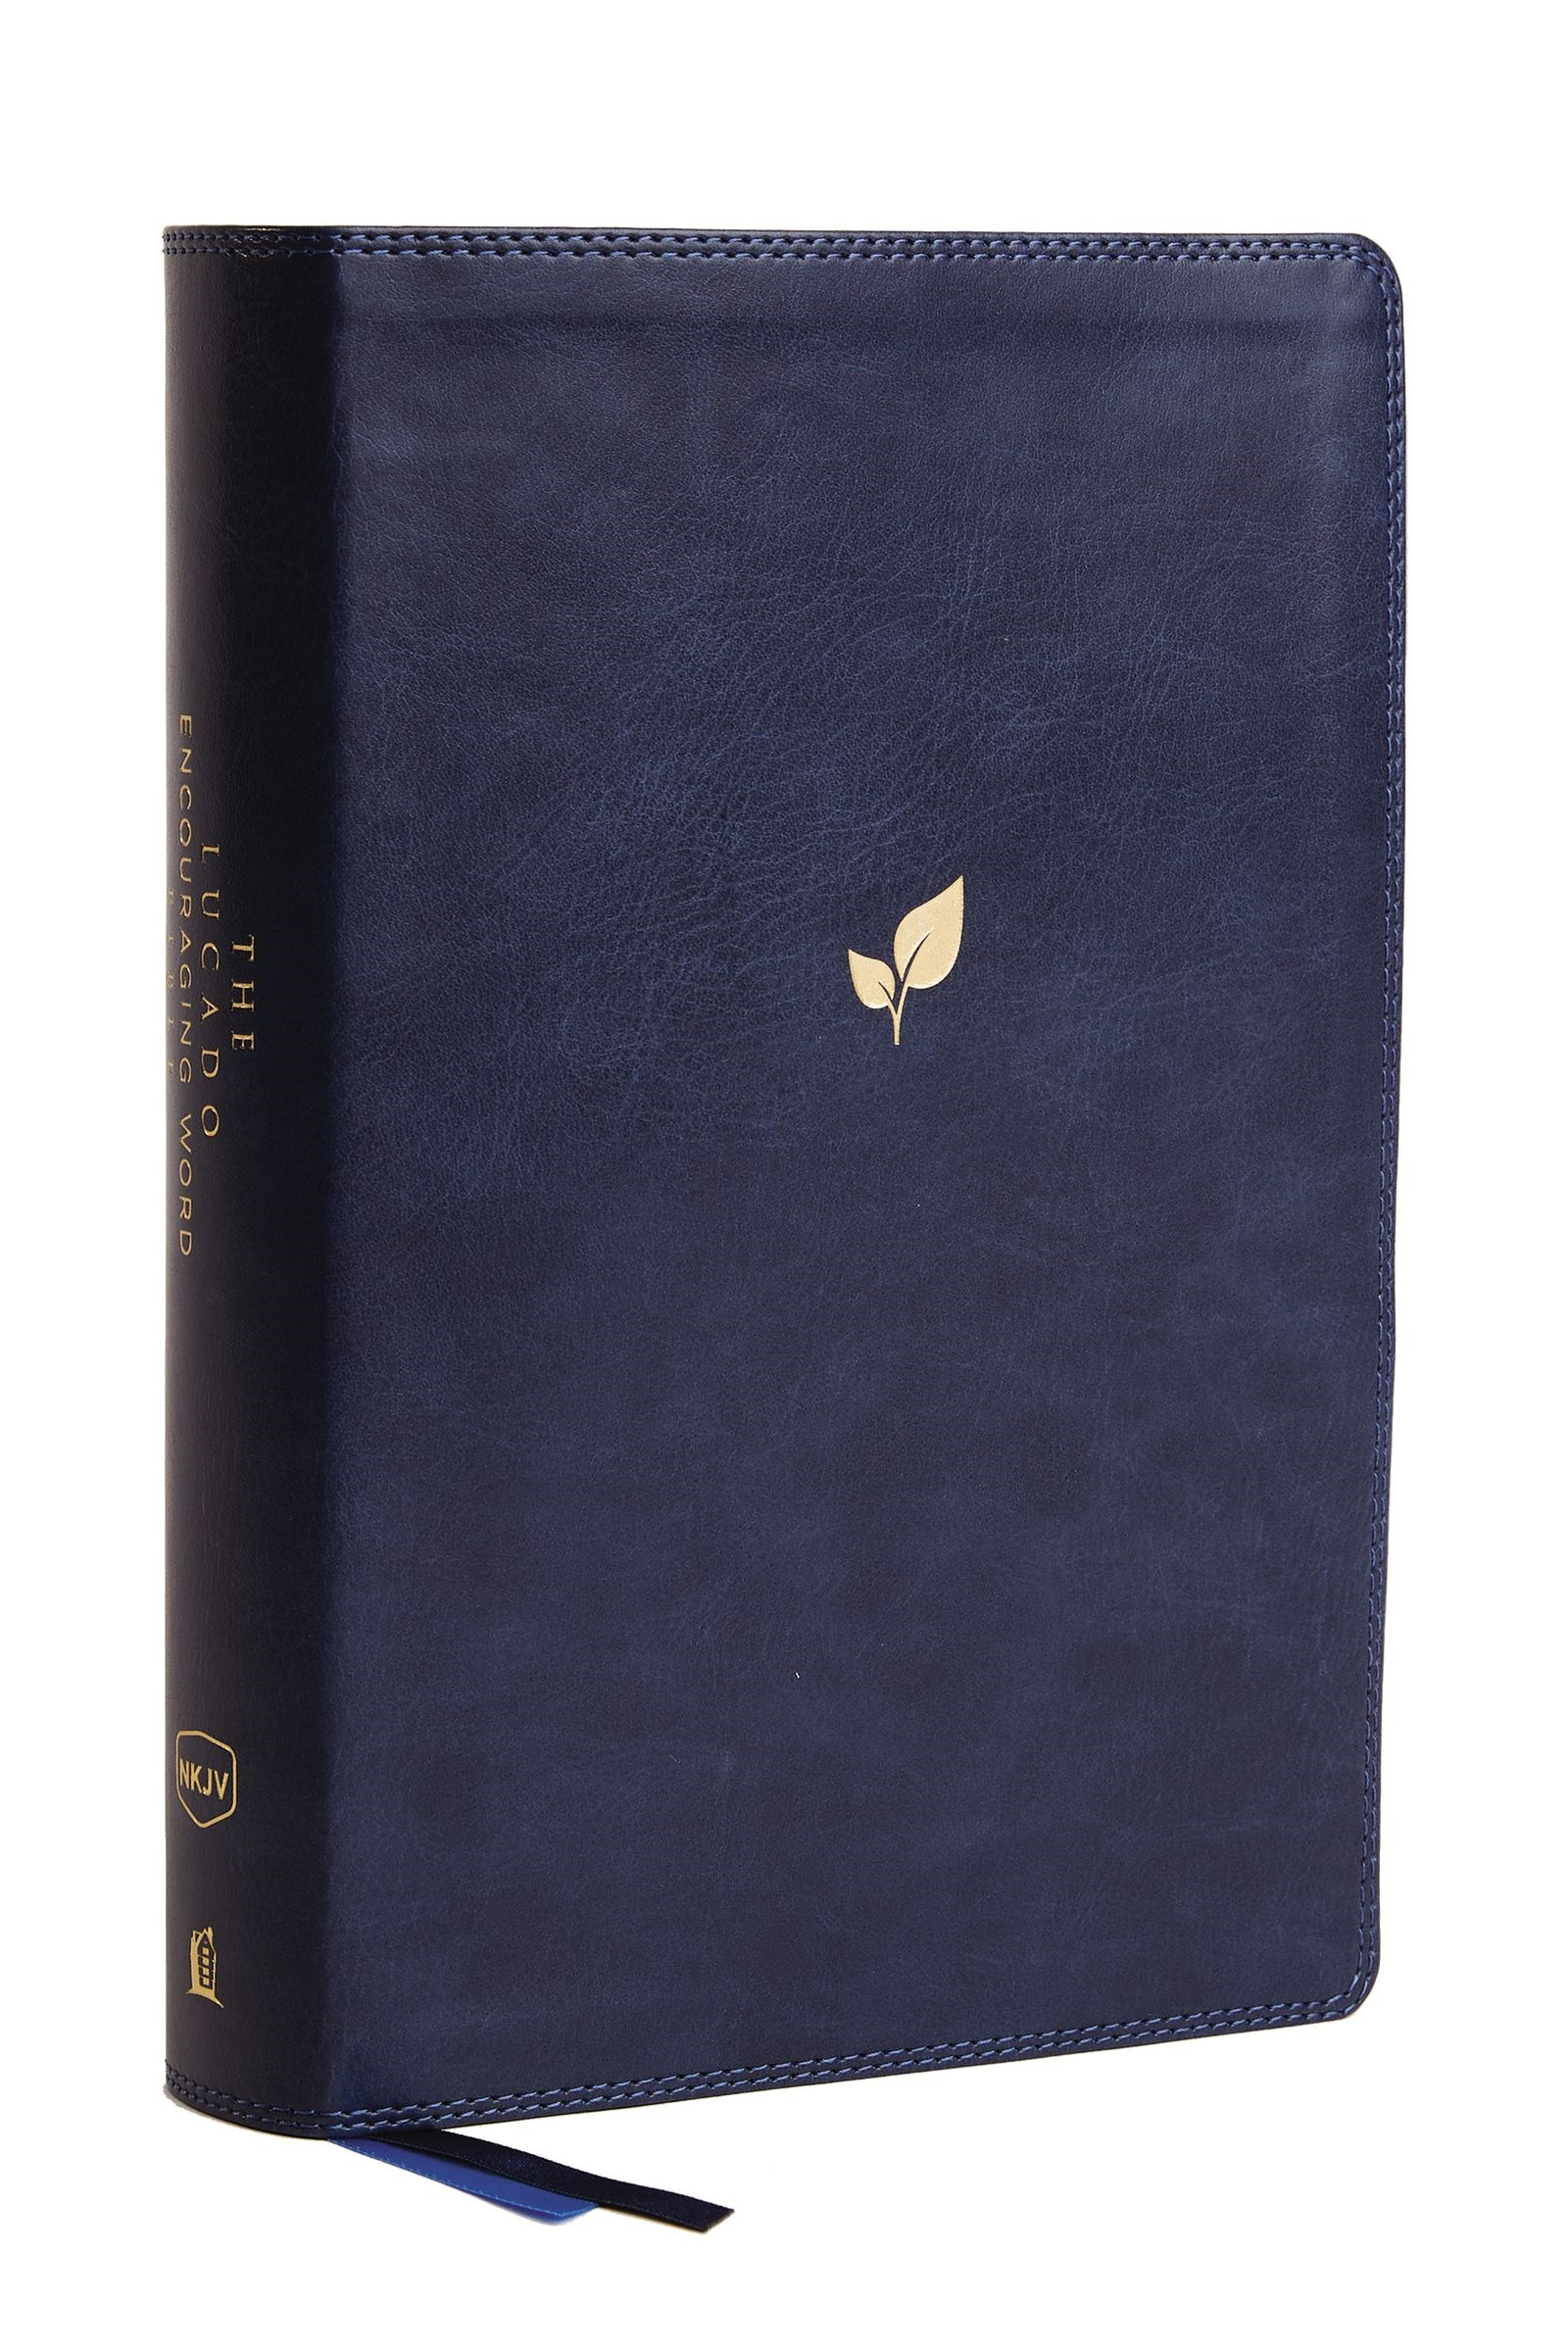 NKJV Lucado Encouraging Word Bible (Comfort Print)-Blue Leathersoft Indexed